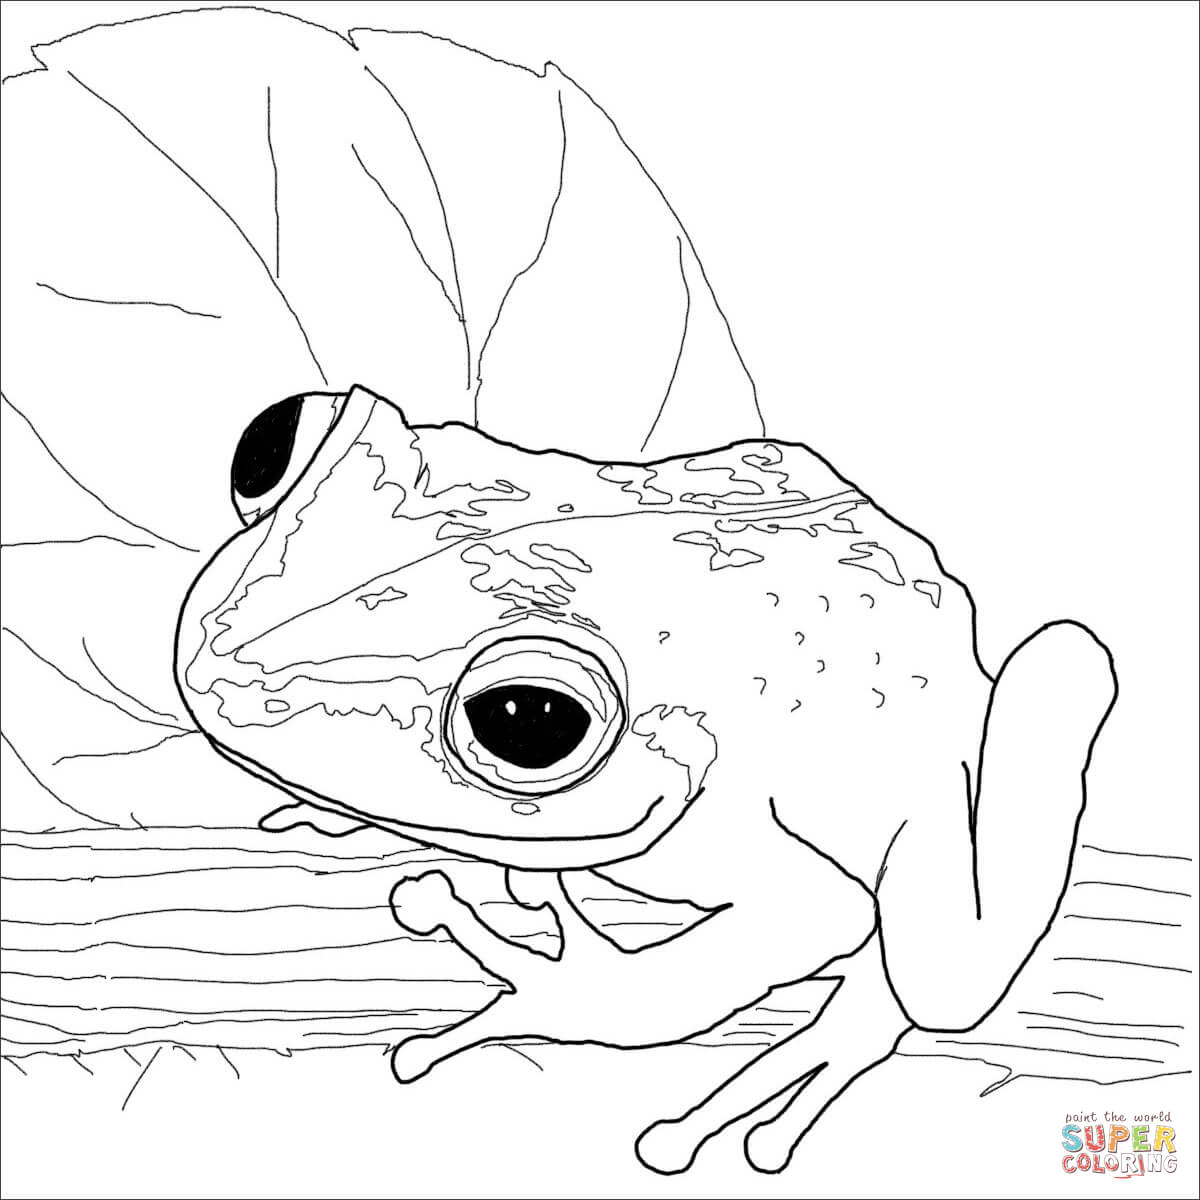 Coqui Drawing at PaintingValley.com.